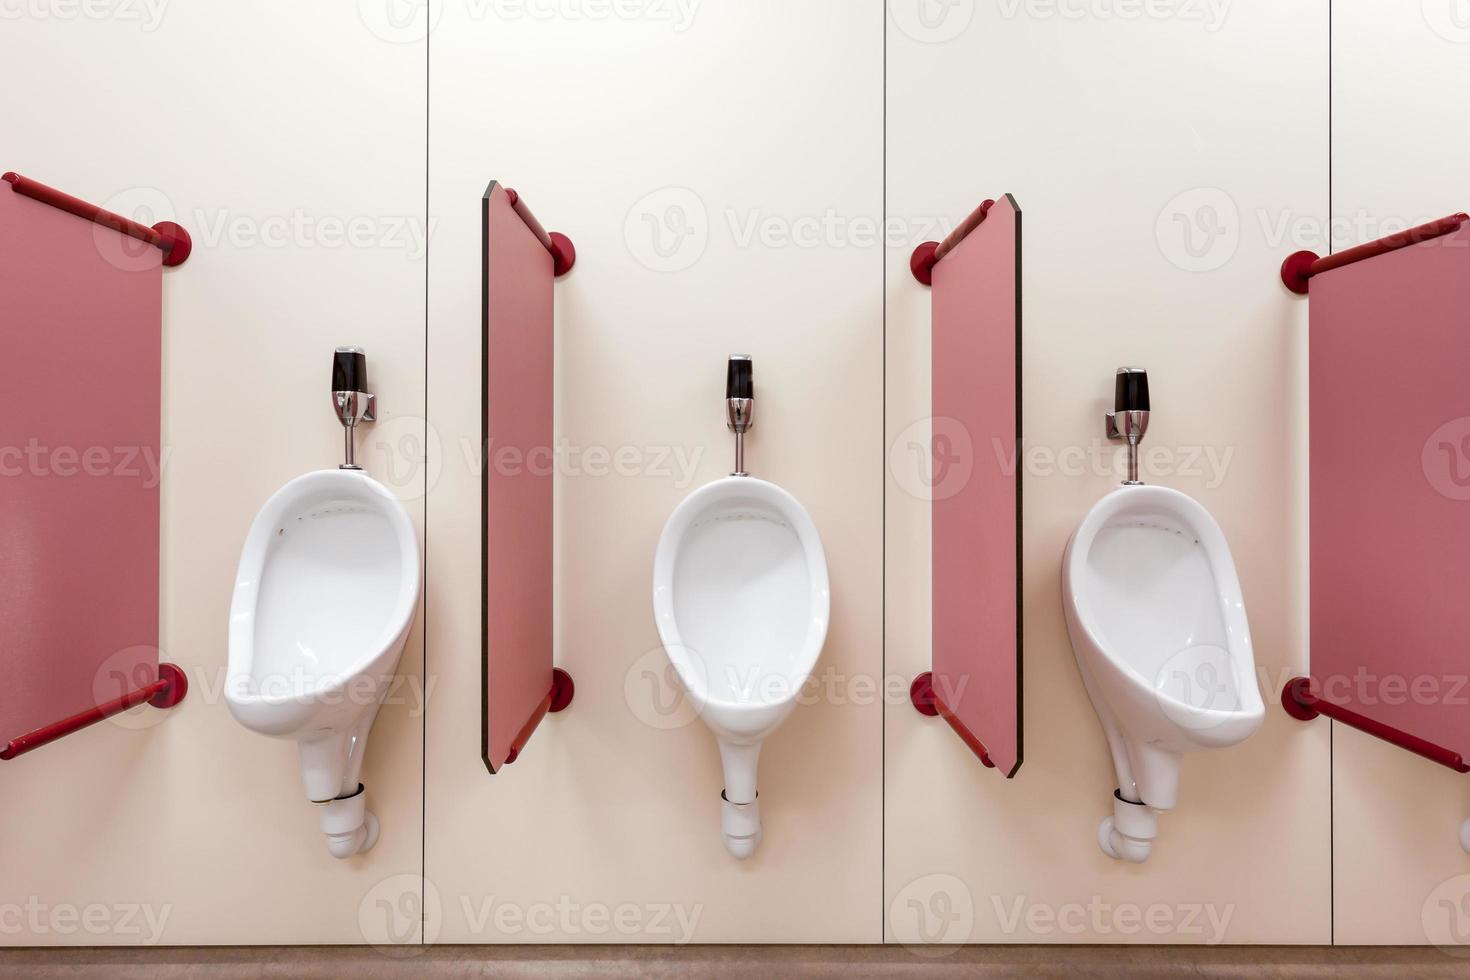 urinario foto